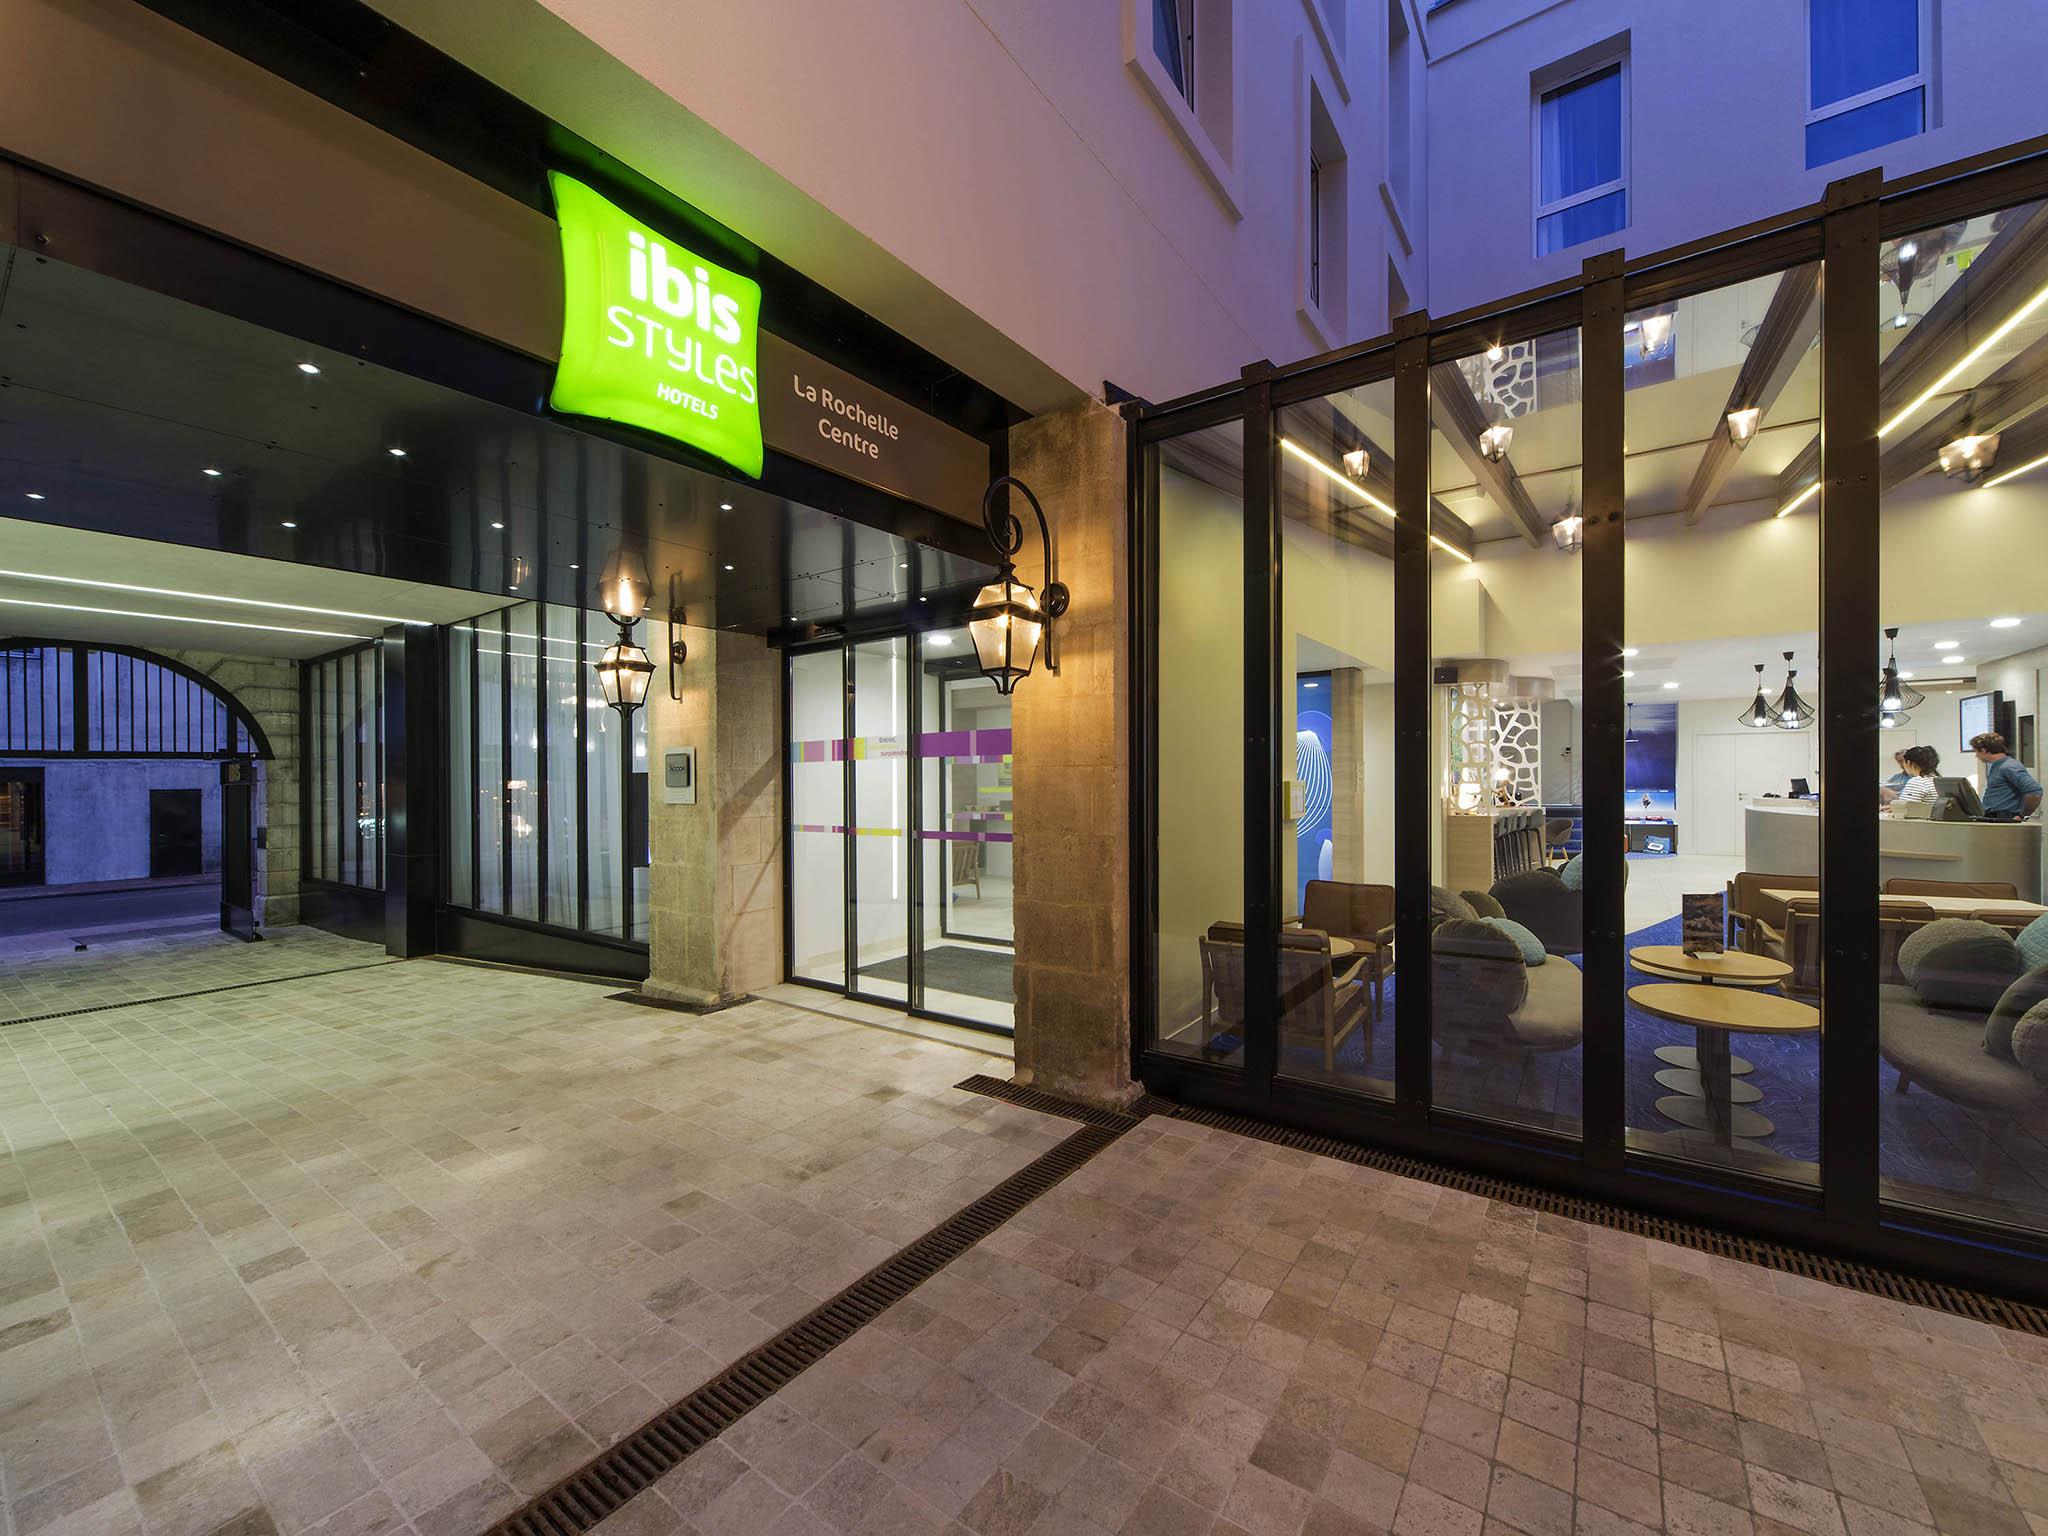 فندق - ibis Styles La Rochelle Centre